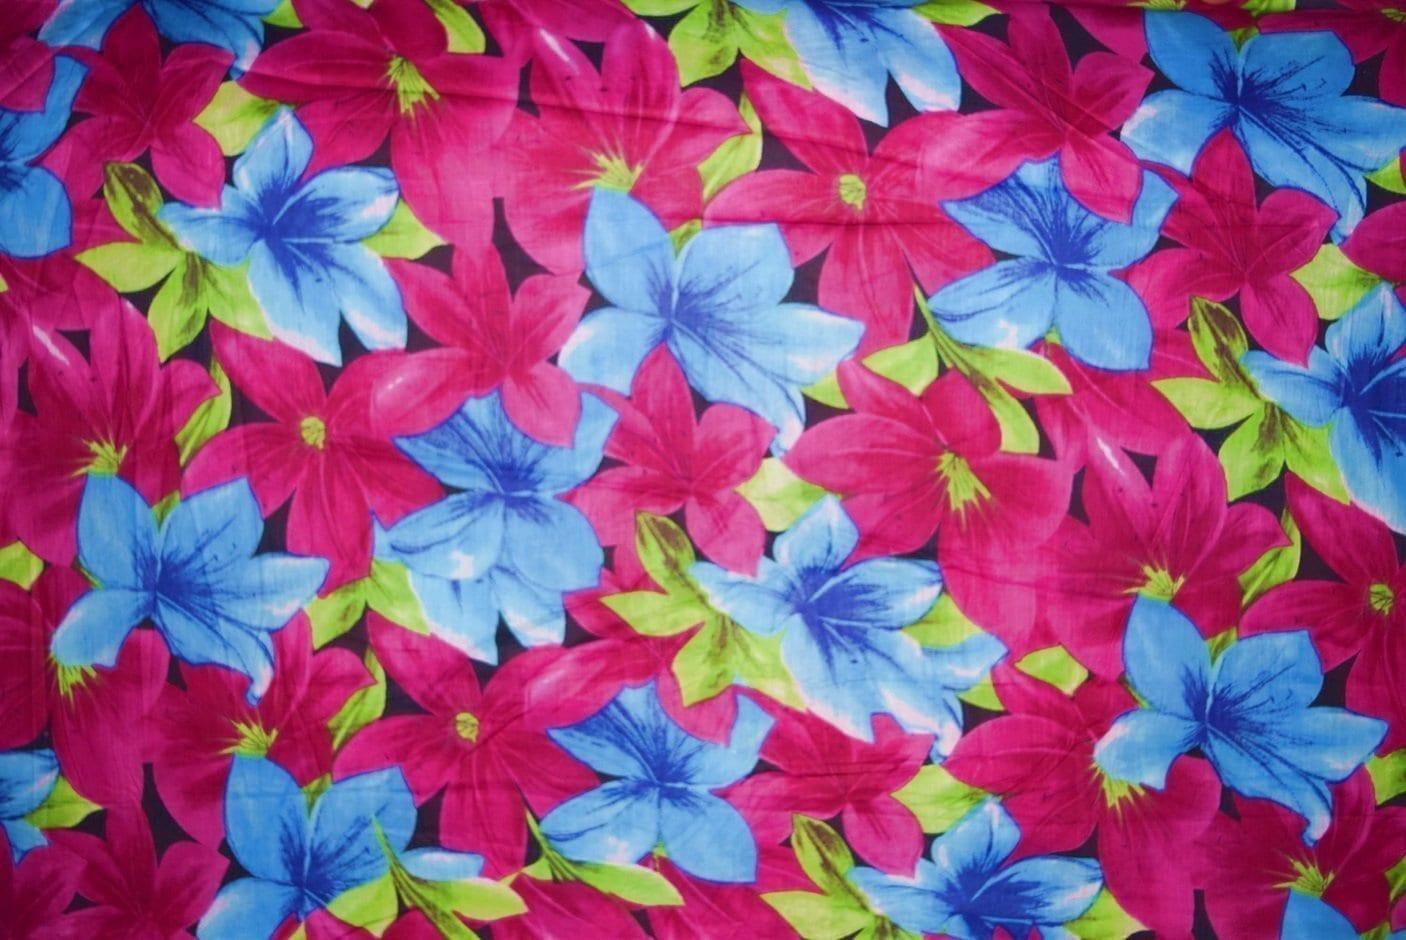 100% PURE Soft COTTON PRINTED fabric PC267 1